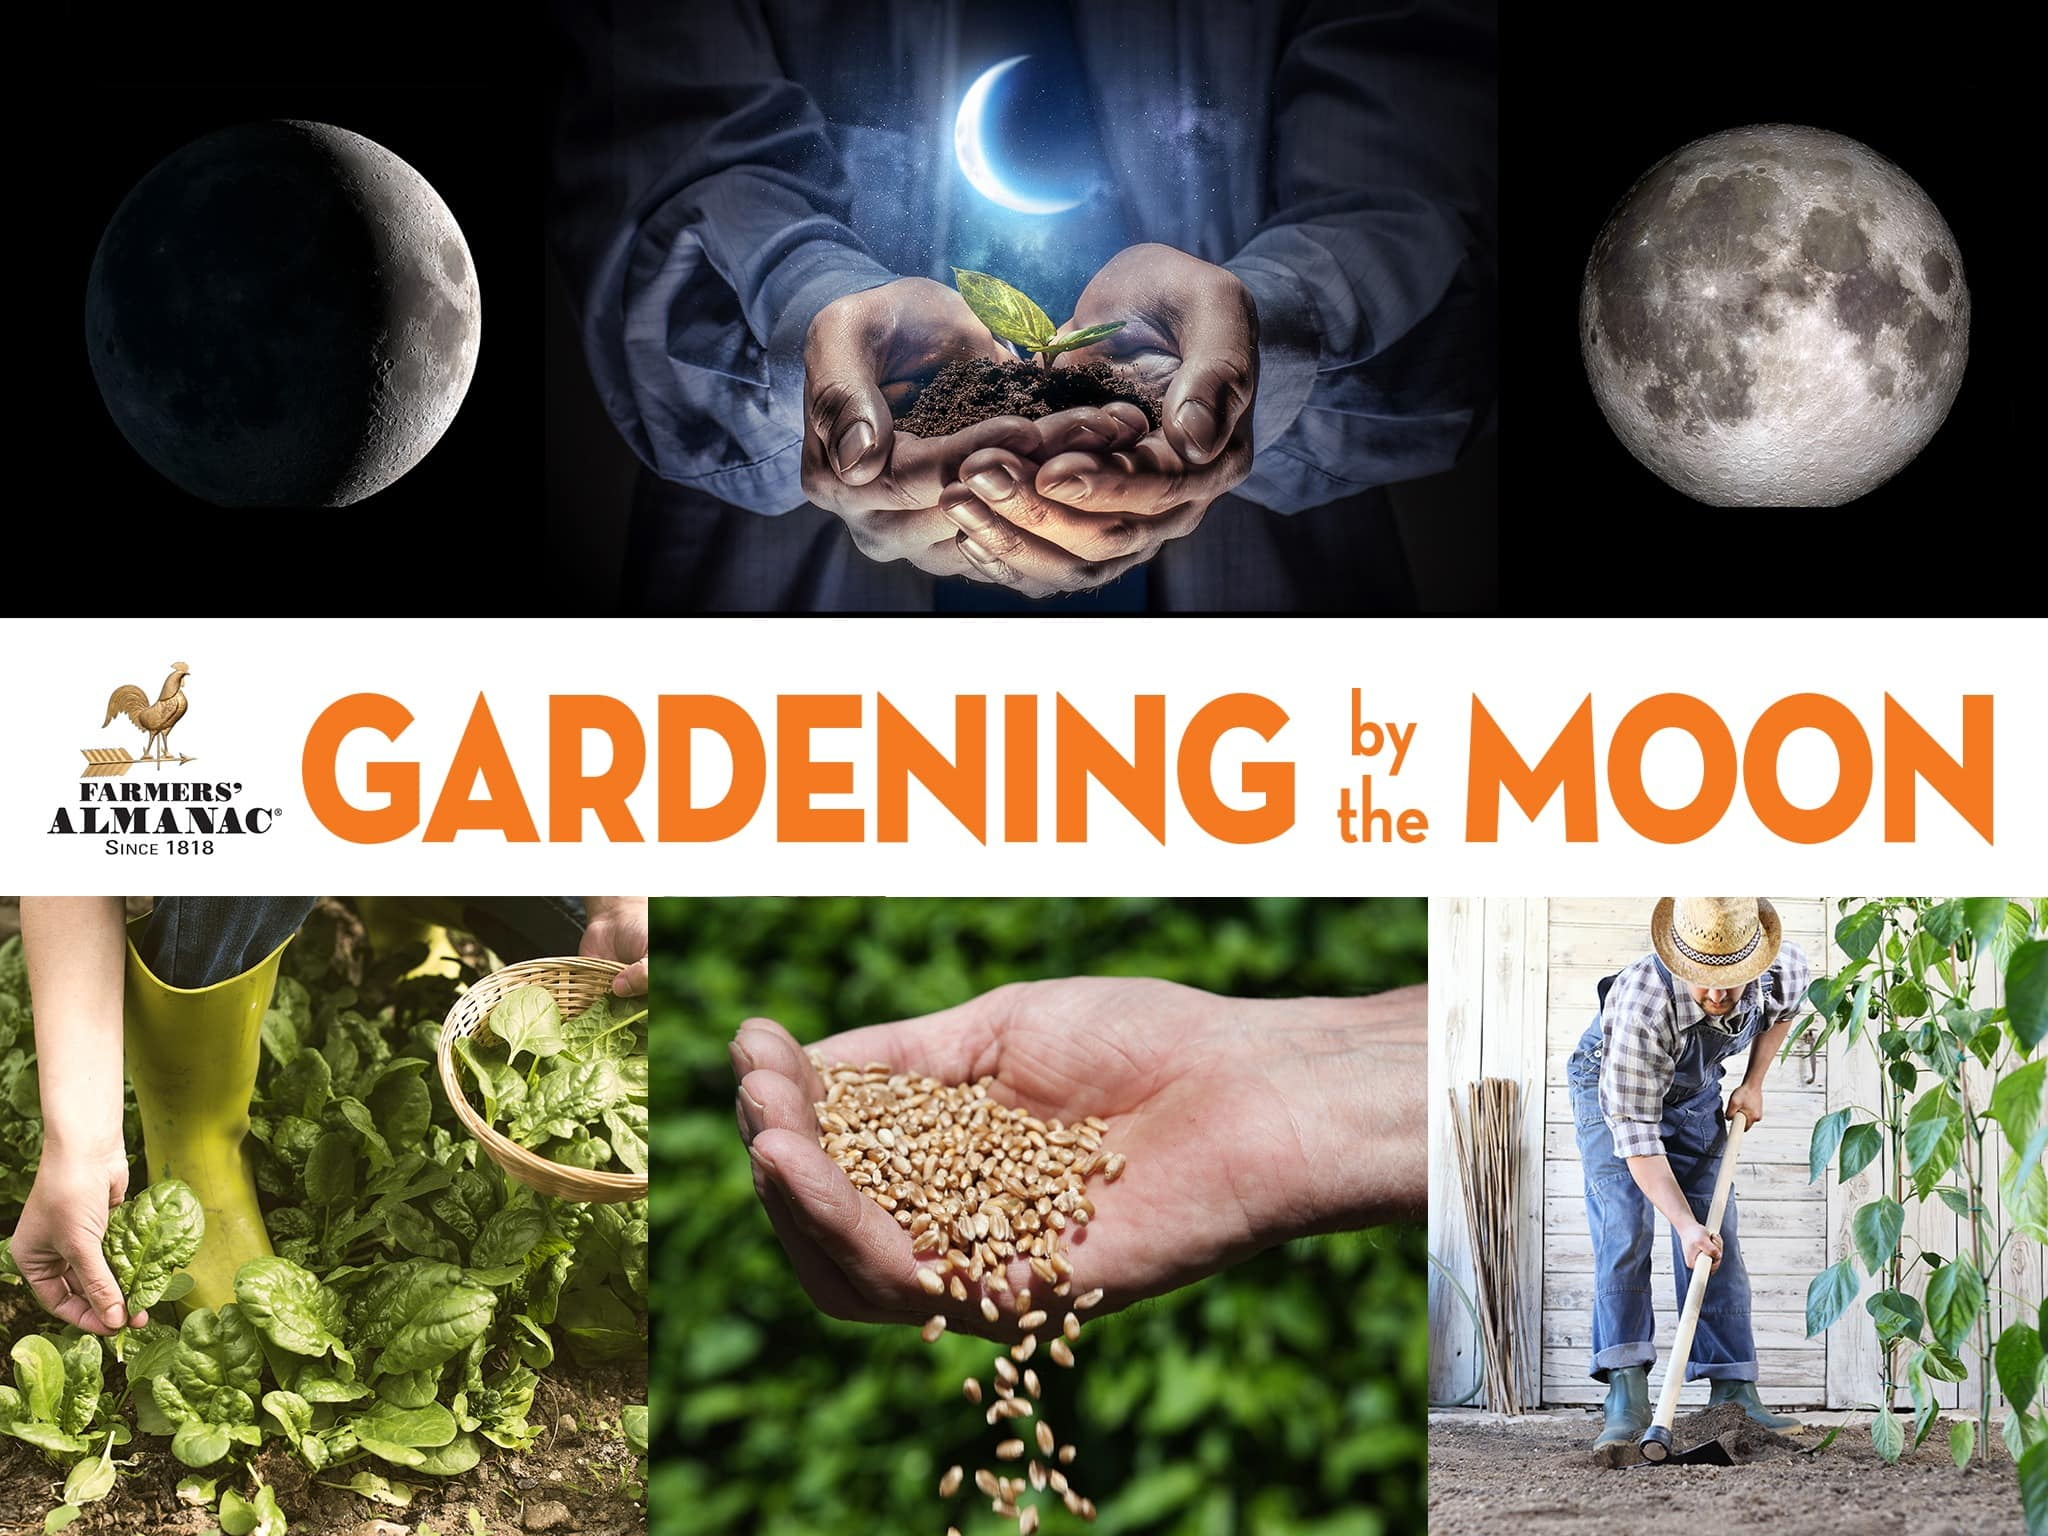 Moon Planting Calendar 2022.Planting By The Moon Gardening Calendar Farmers Almanac